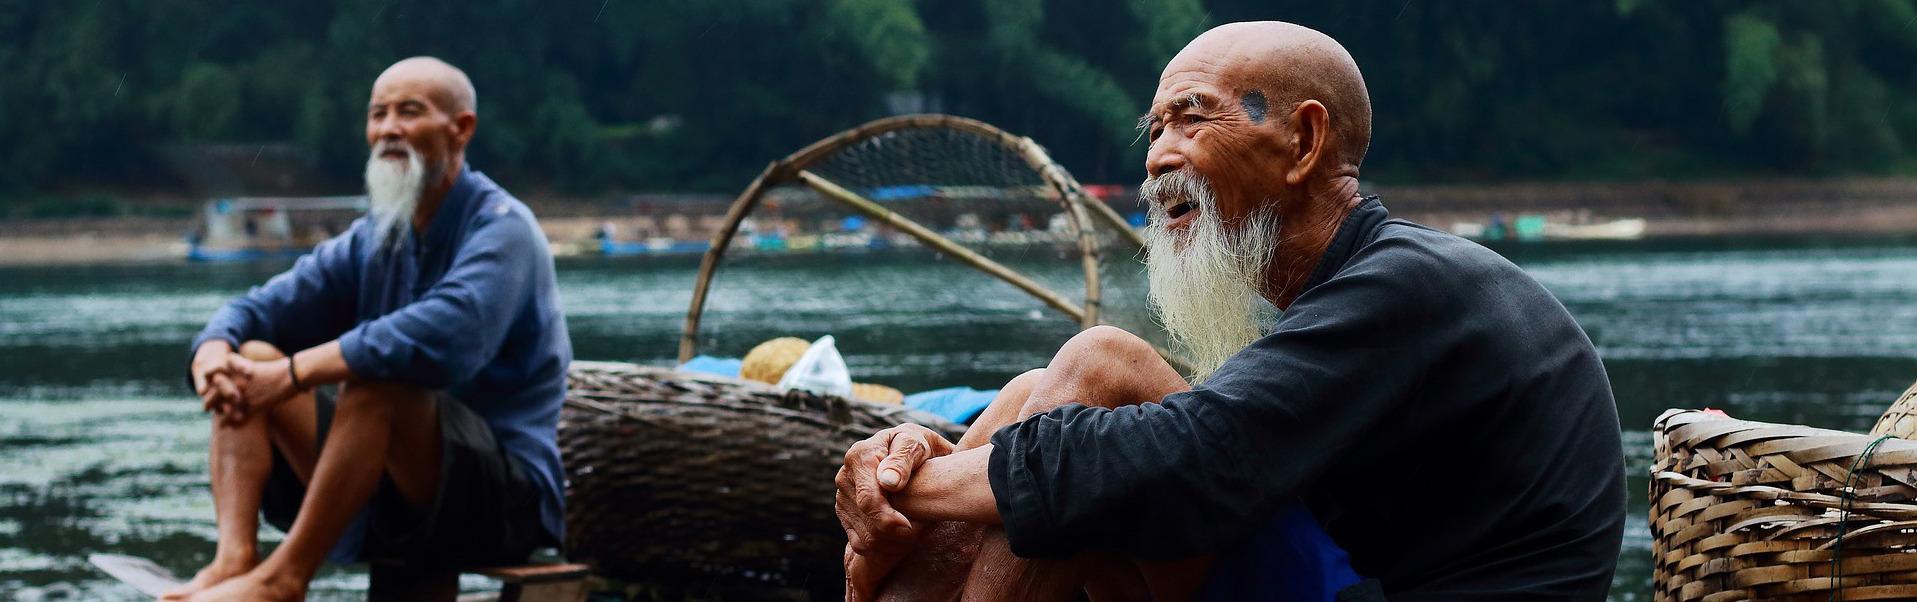 fisherman-1863914_1920.jpg